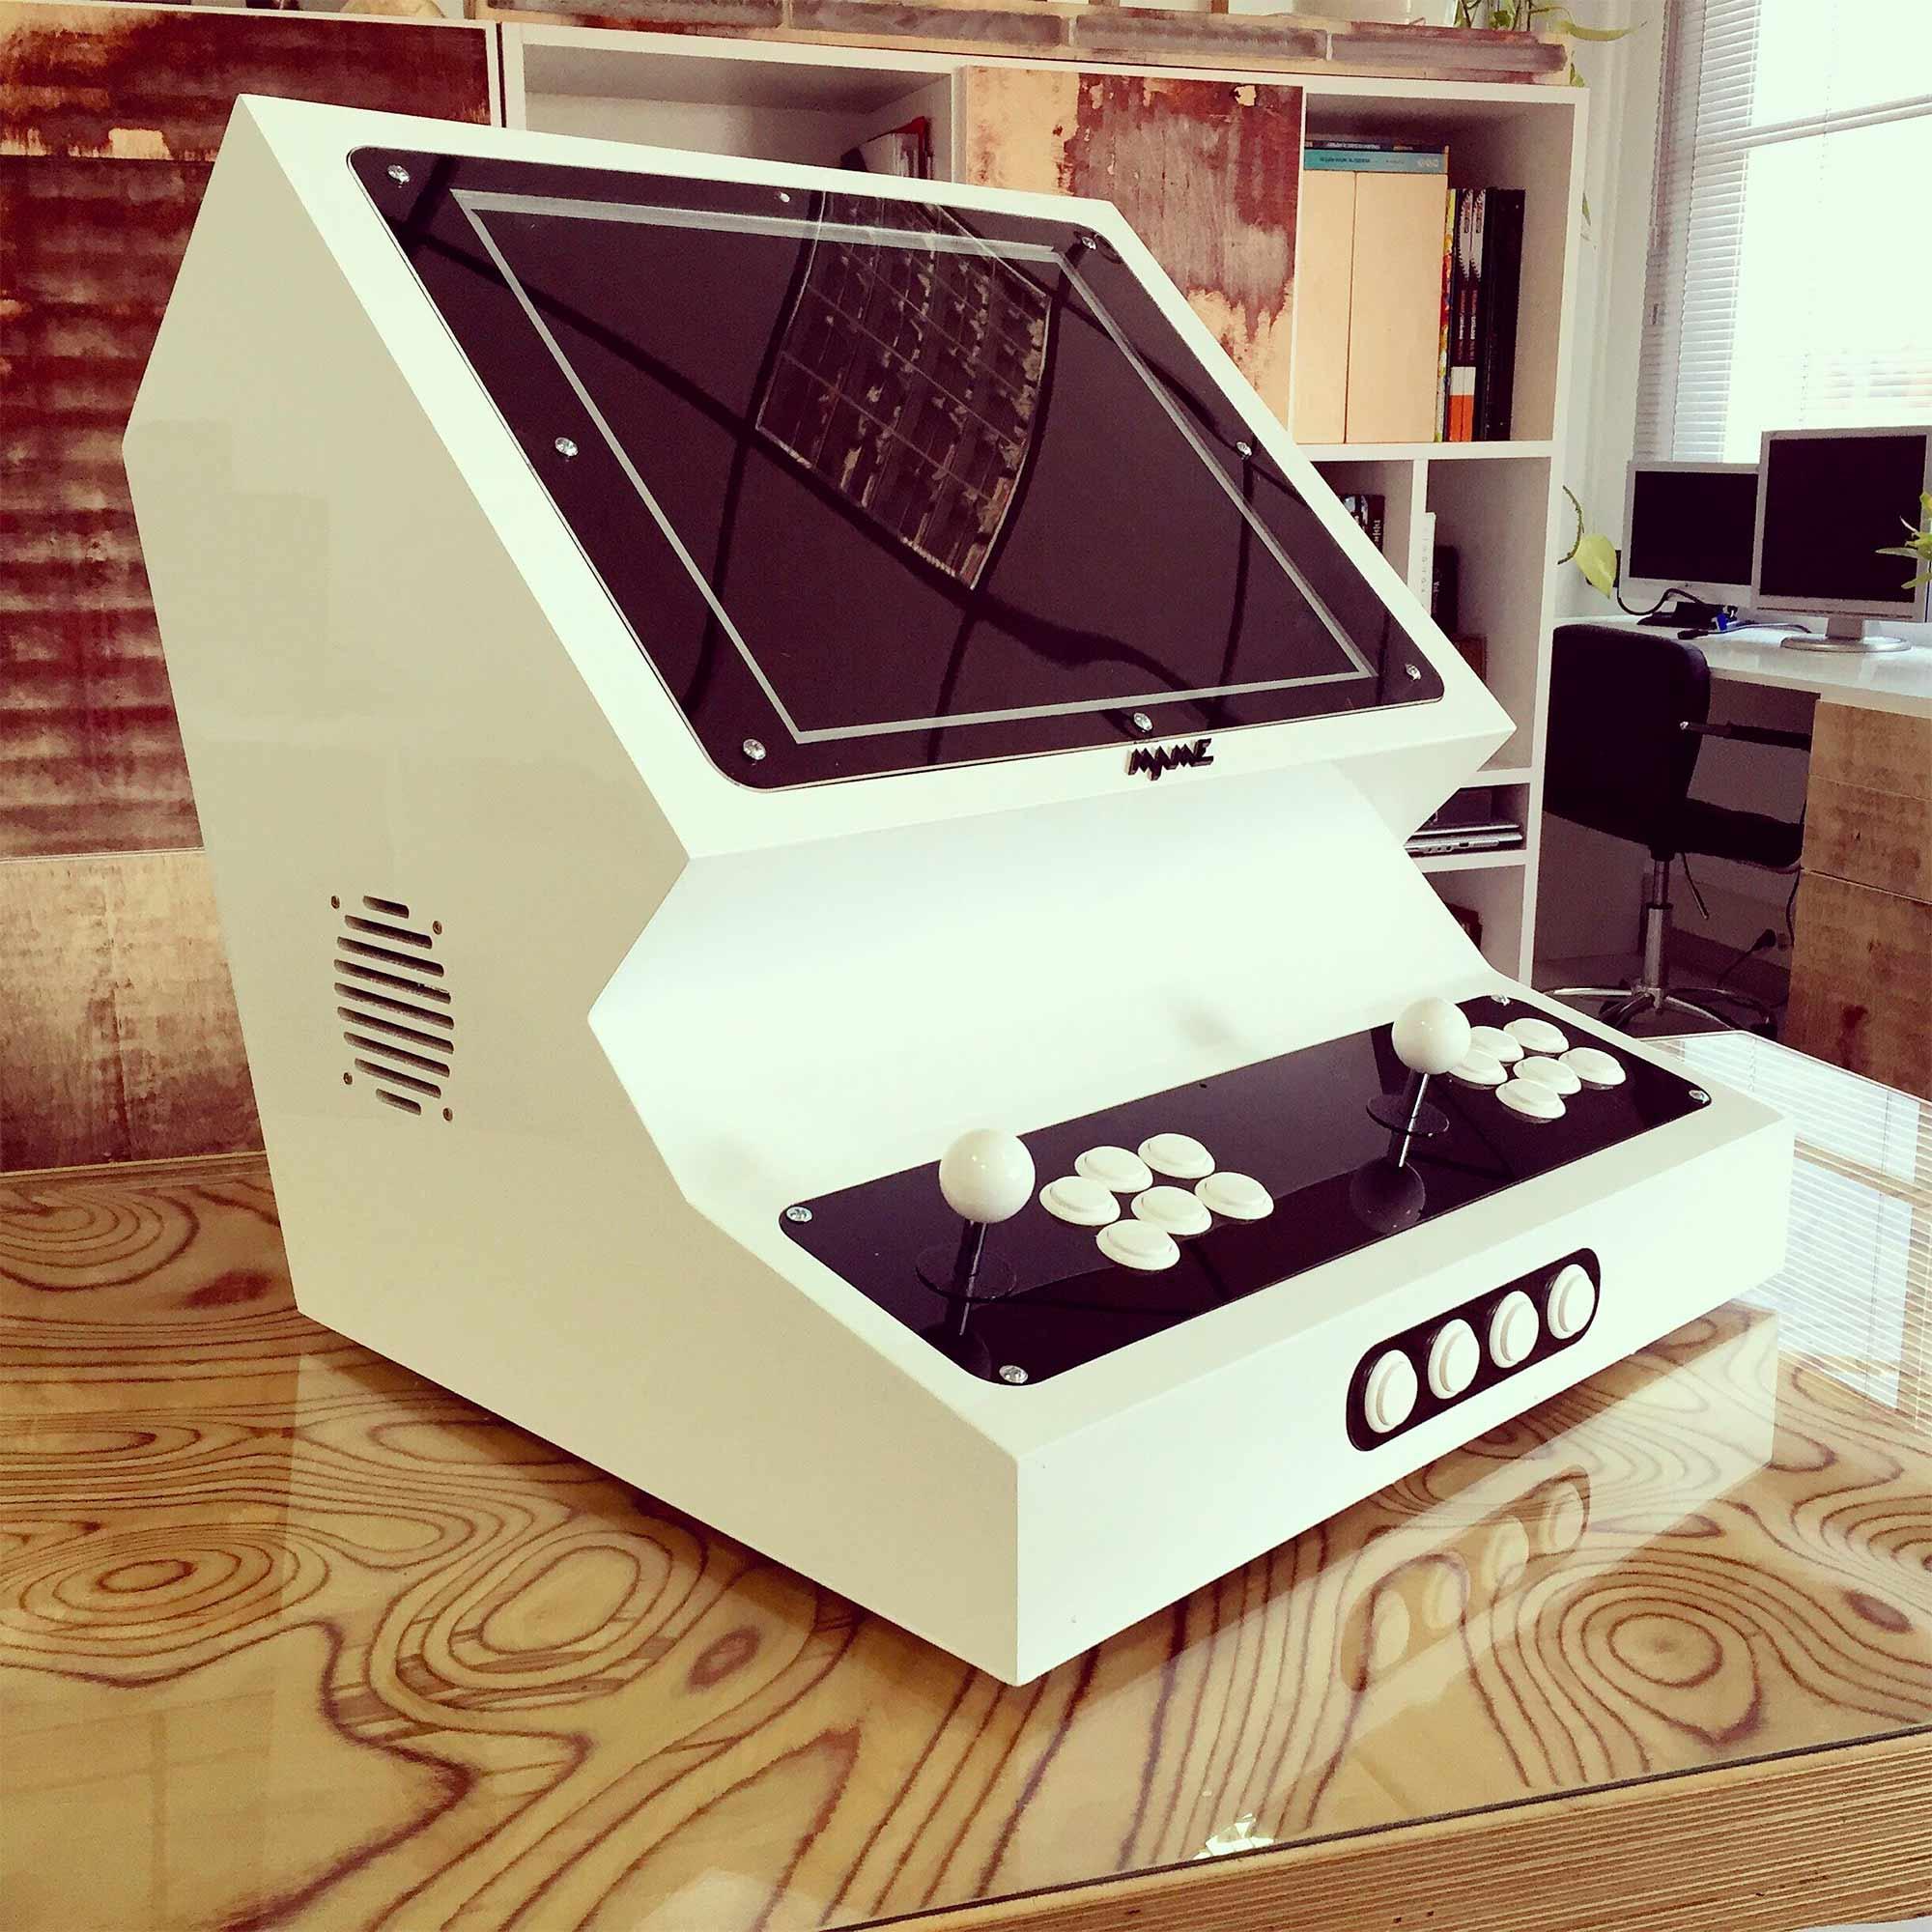 EX-arcade-_-Diseño-_-EXarchitects_05